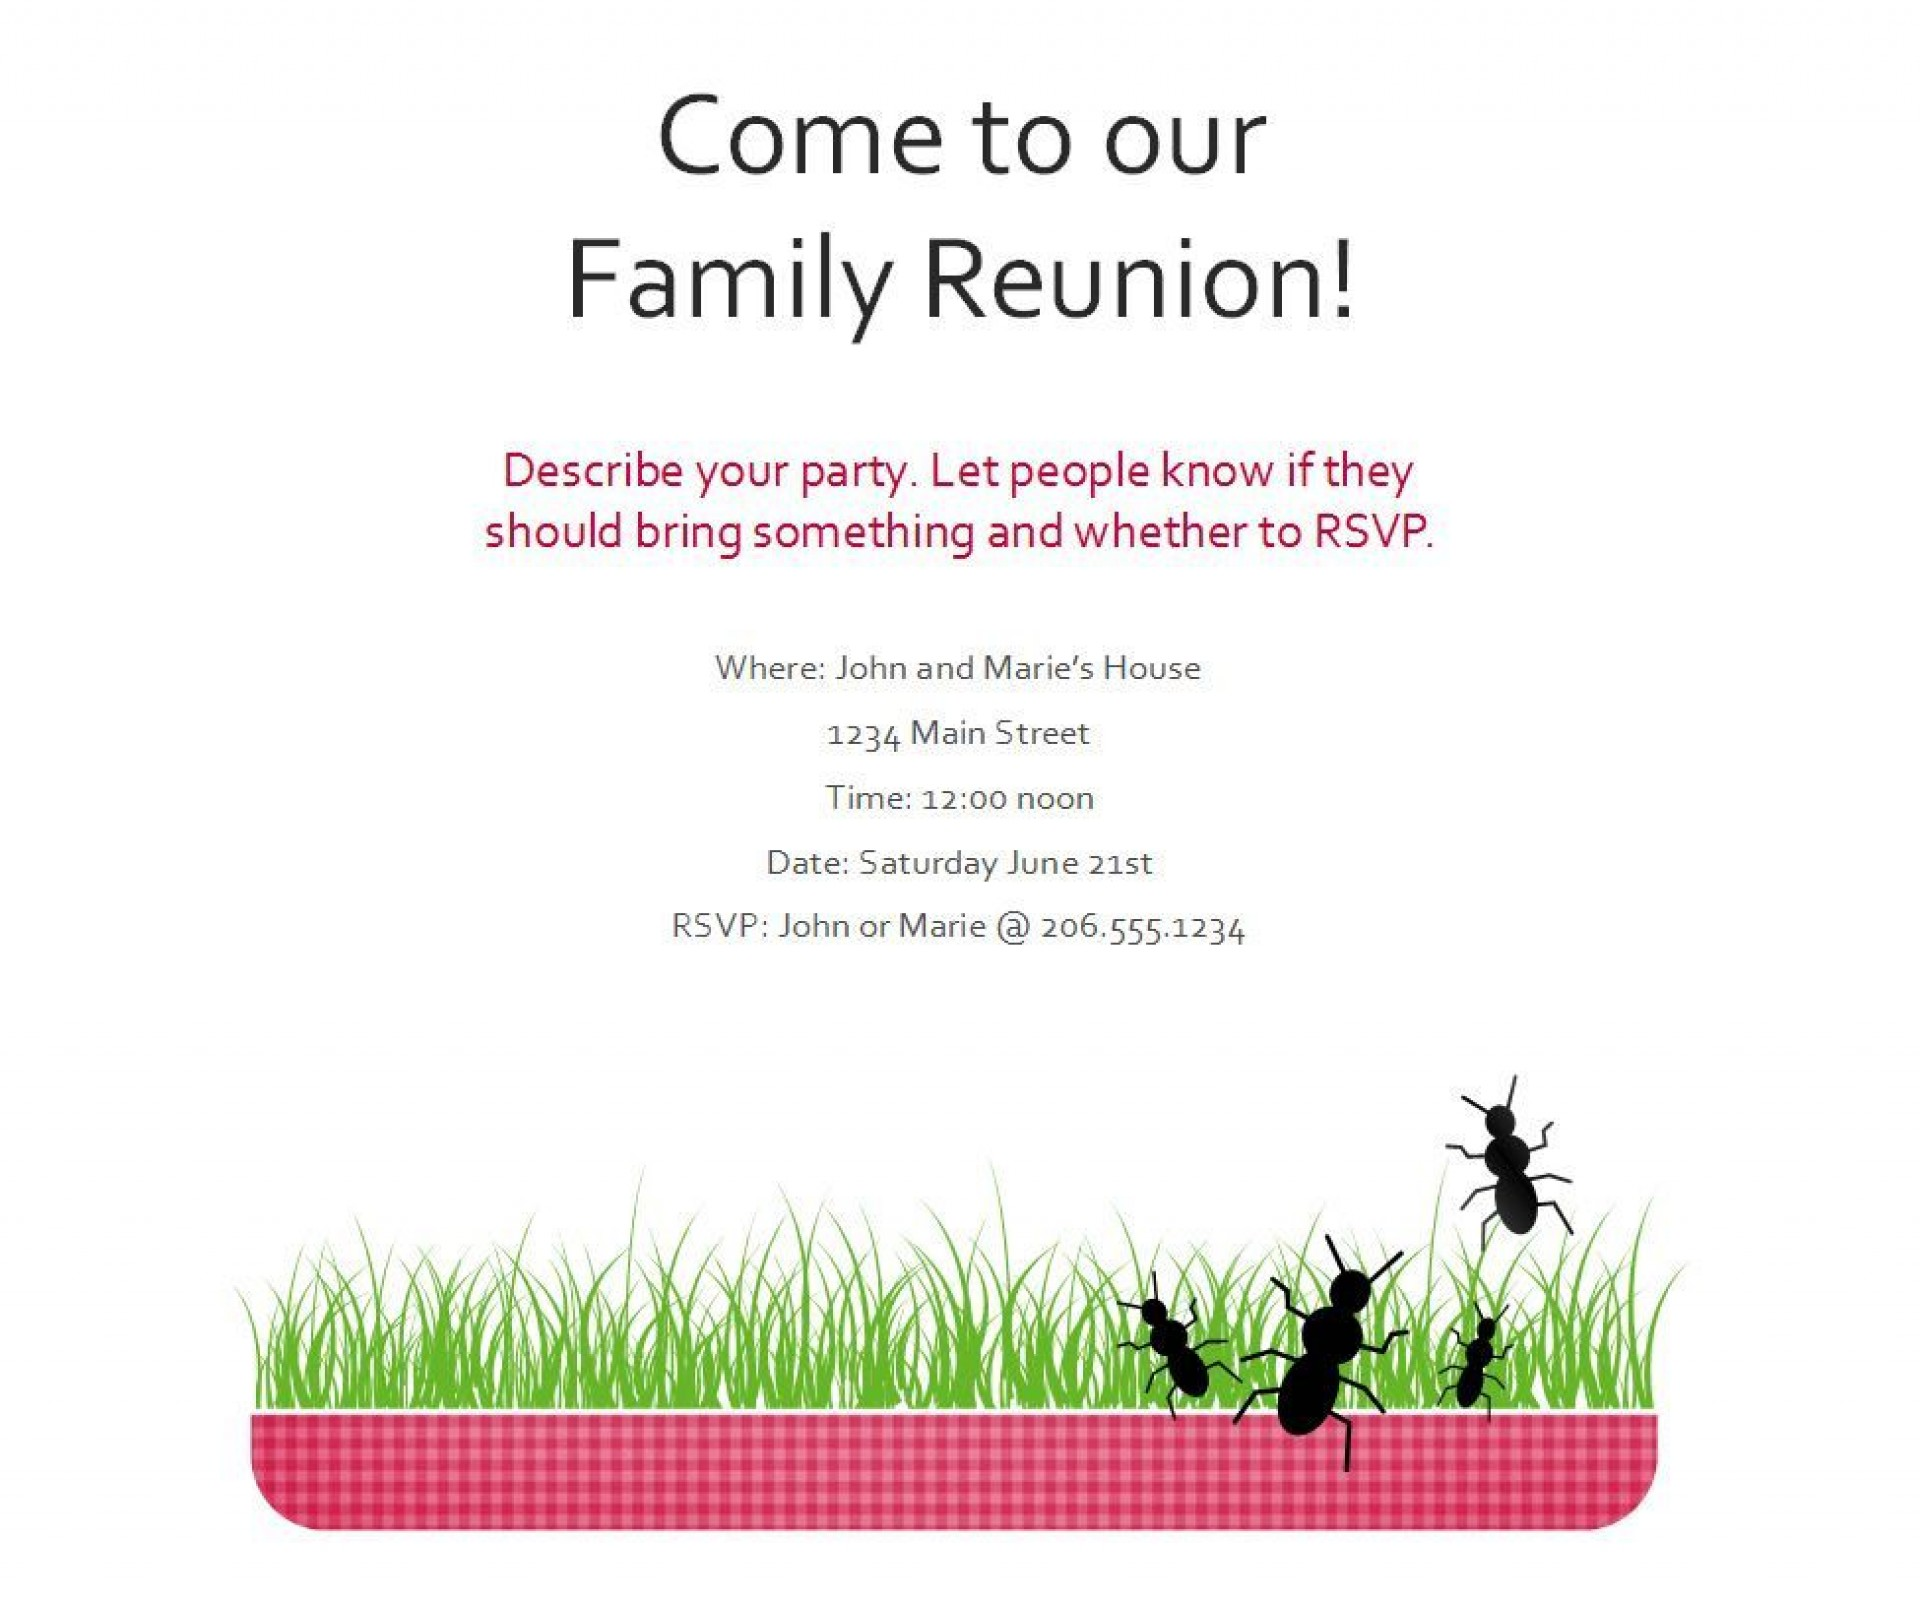 008 Wondrou Family Reunion Flyer Template Free Idea  Downloadable Printable Invitation1920